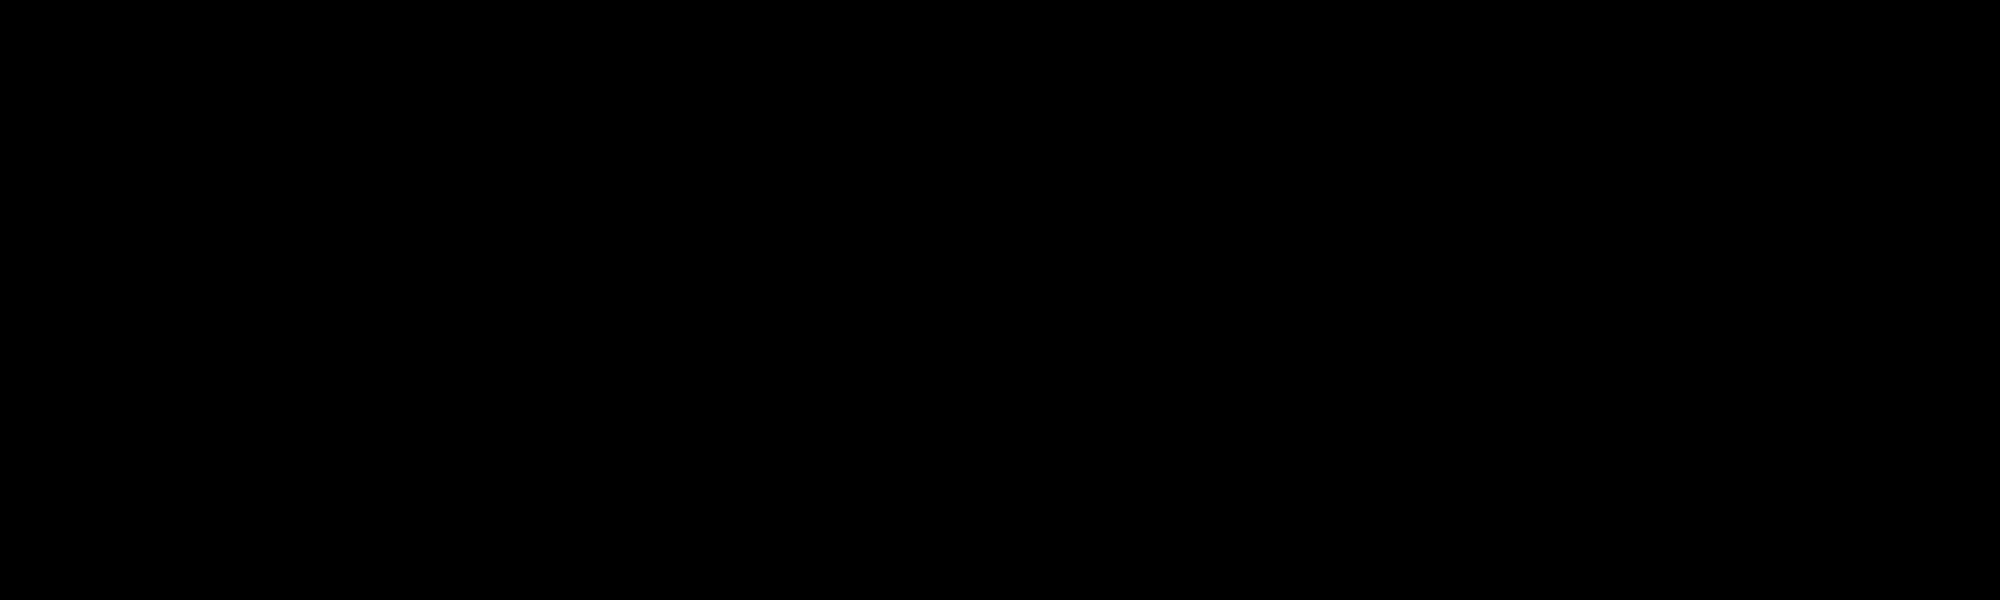 Copy of Rose Quartz - white (19)